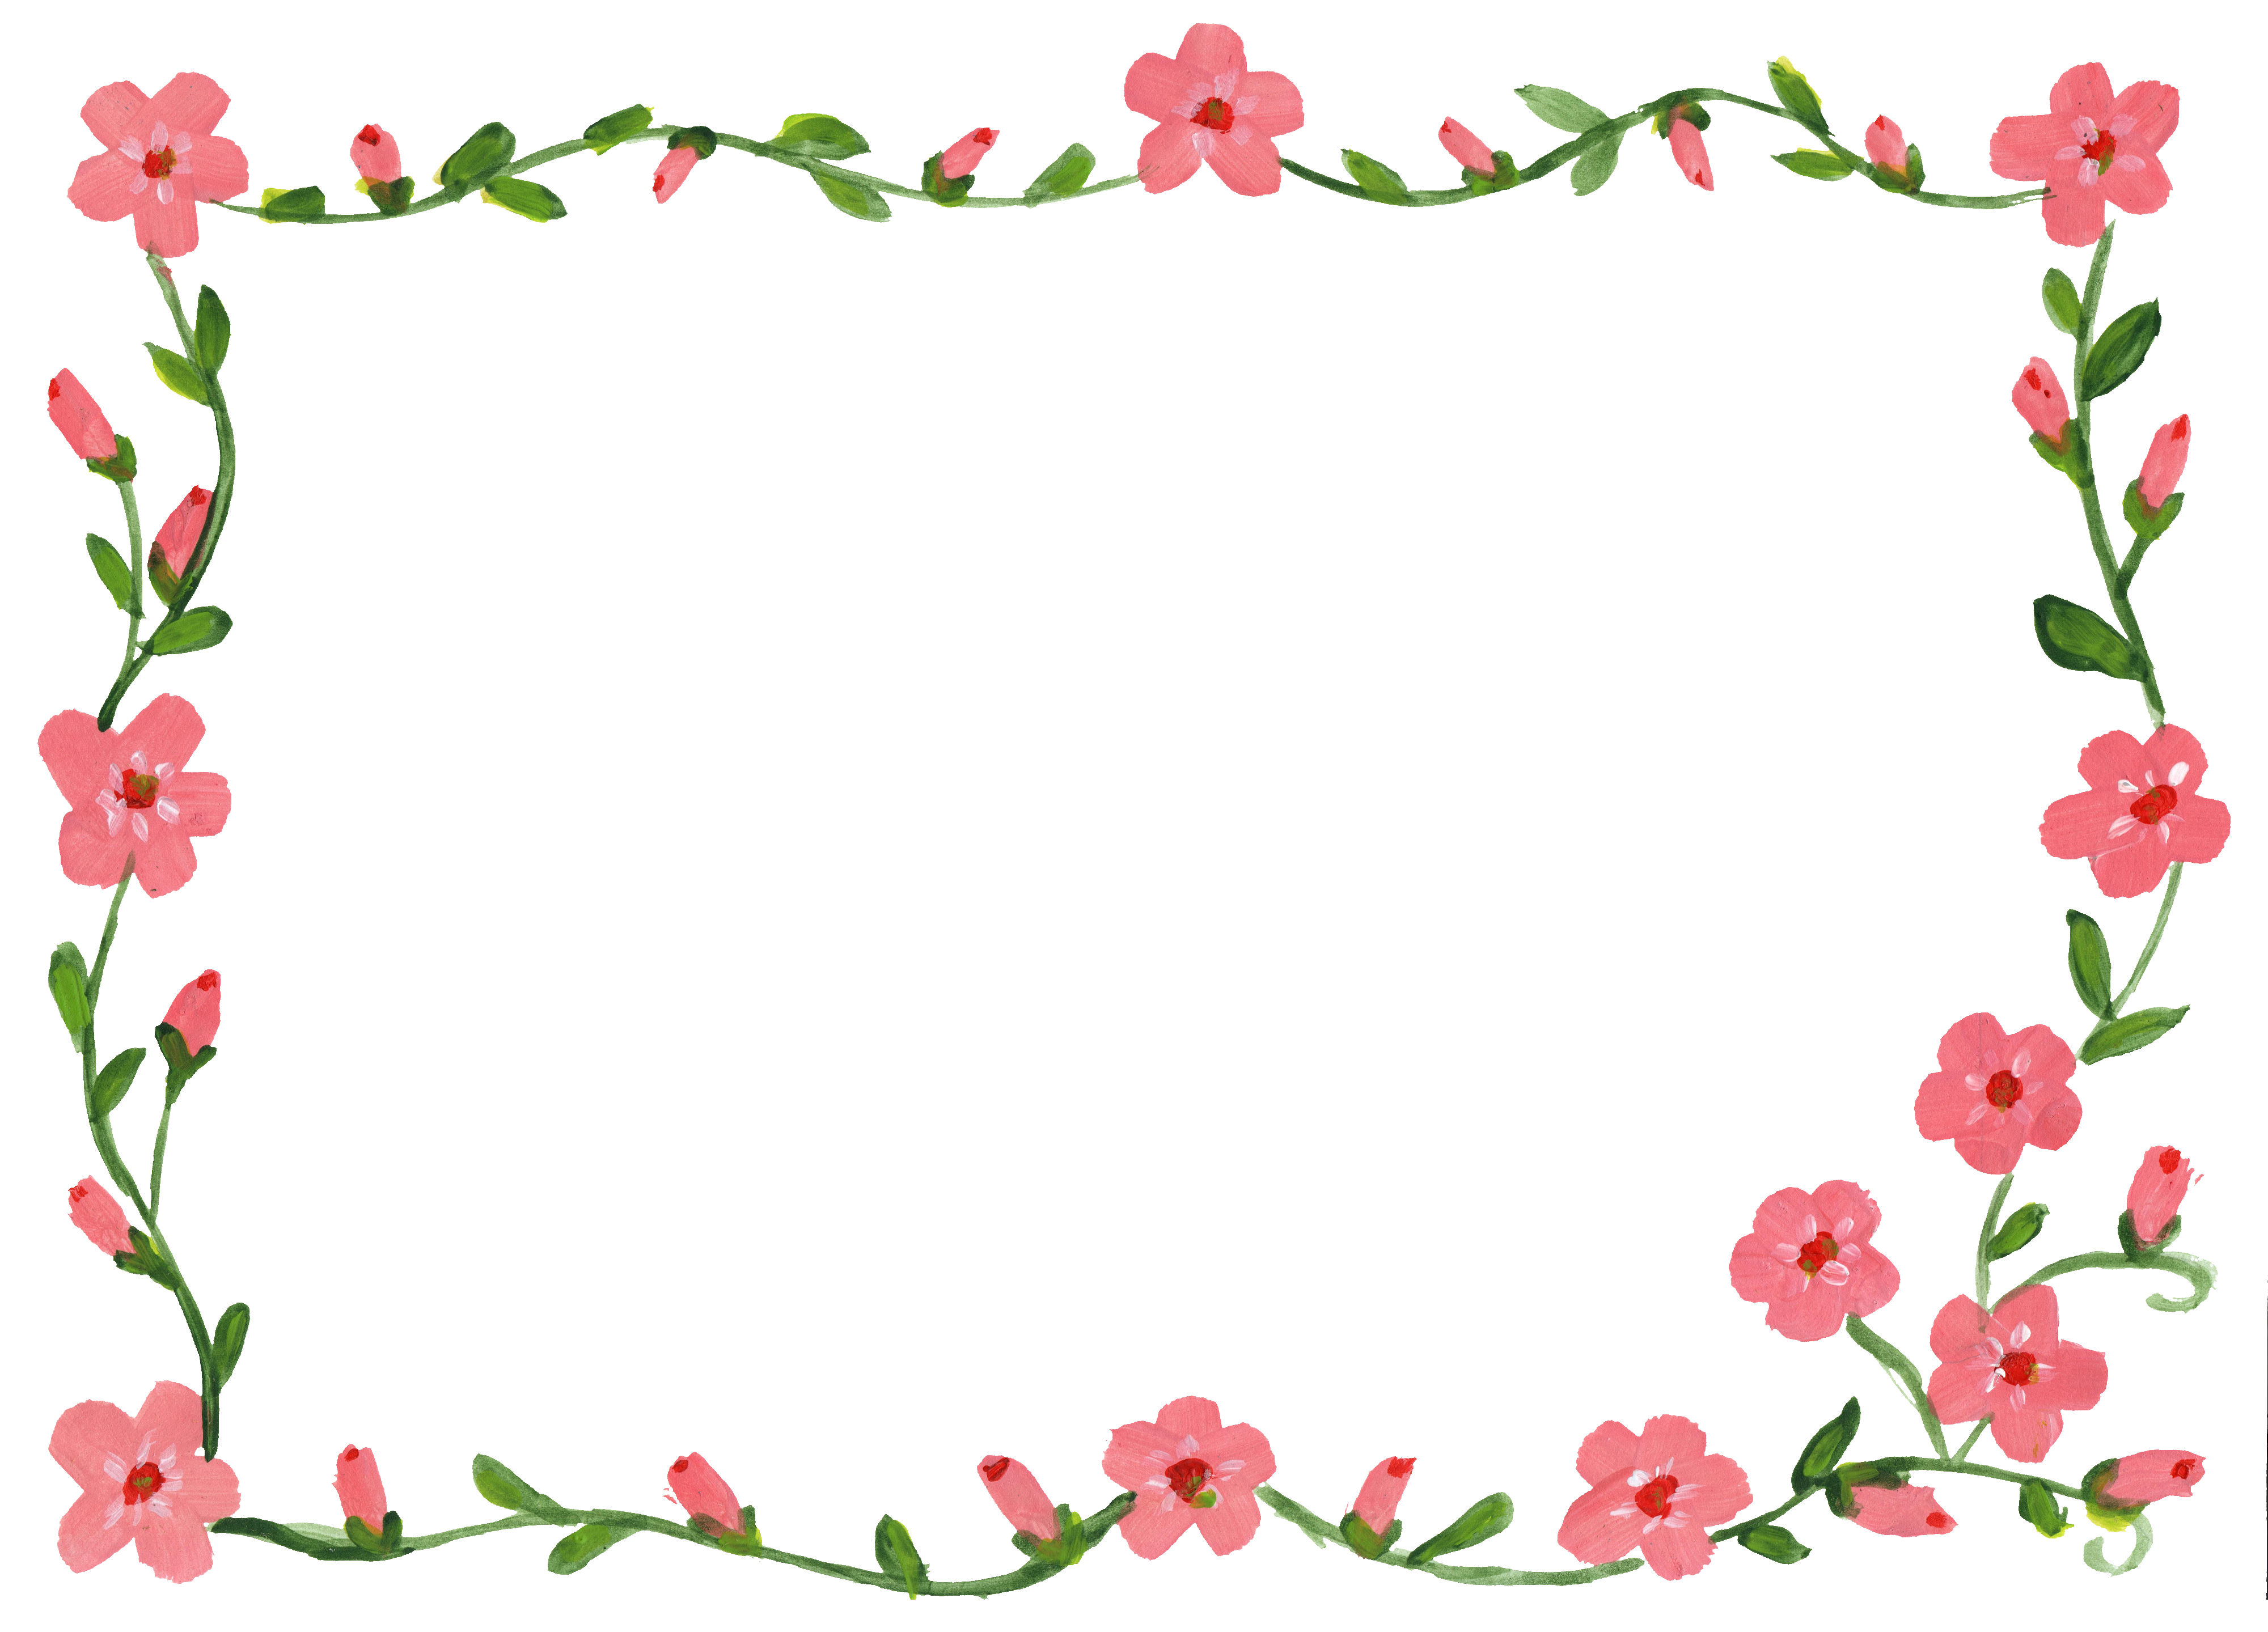 9 Floral Flower Frame (JPG) | OnlyGFX.com